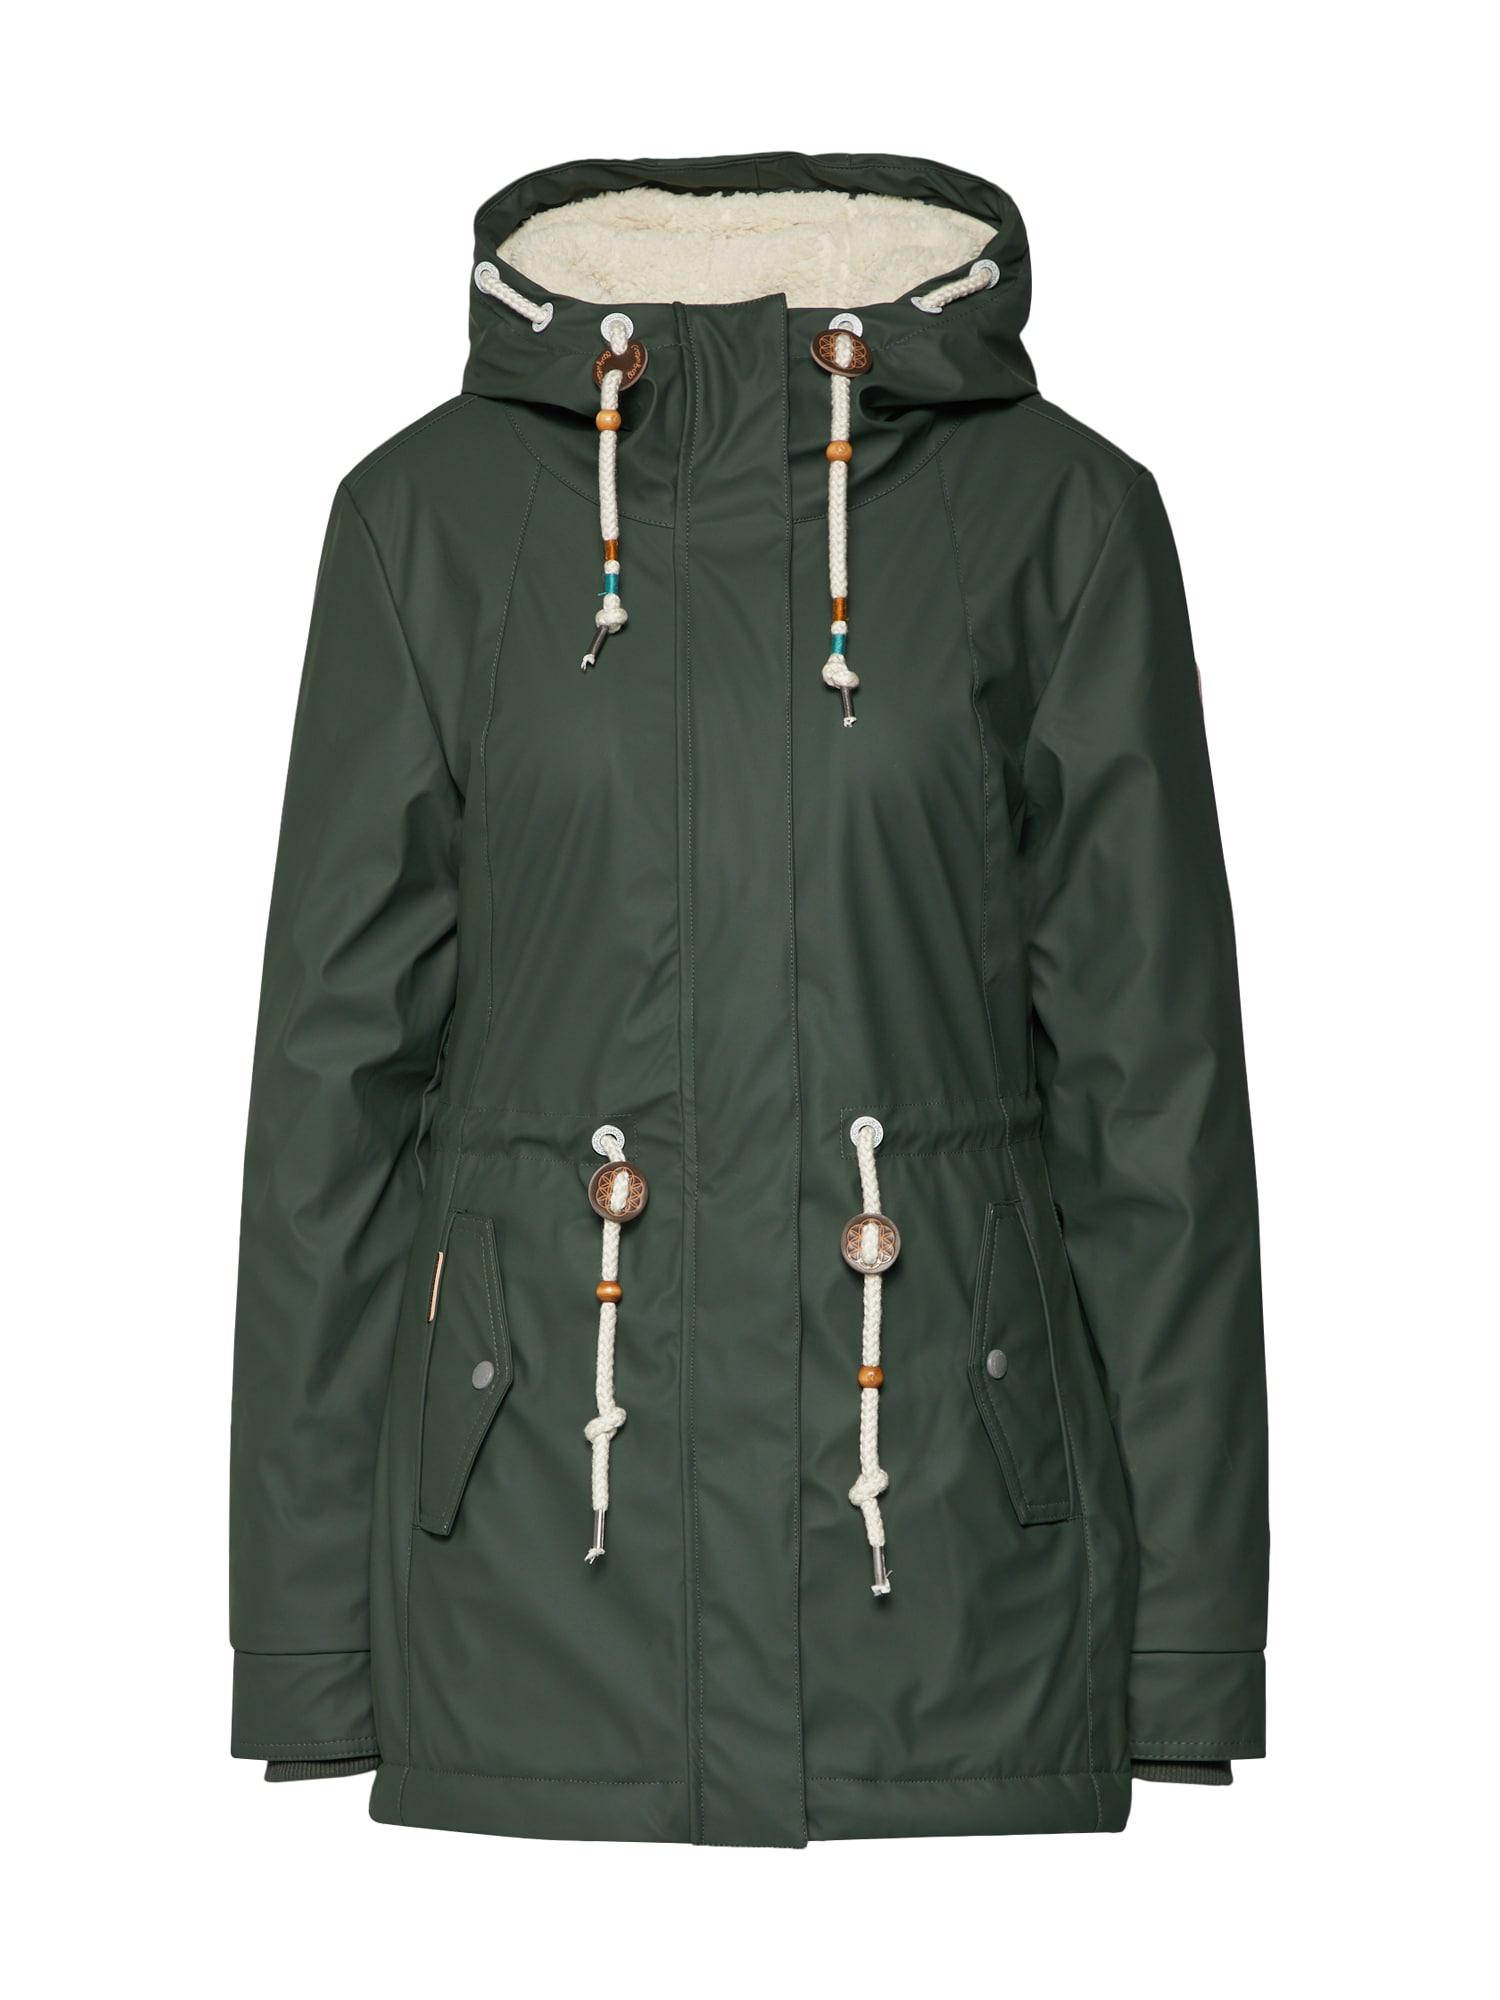 Přechodná bunda Monadis Rainy tmavě zelená Ragwear